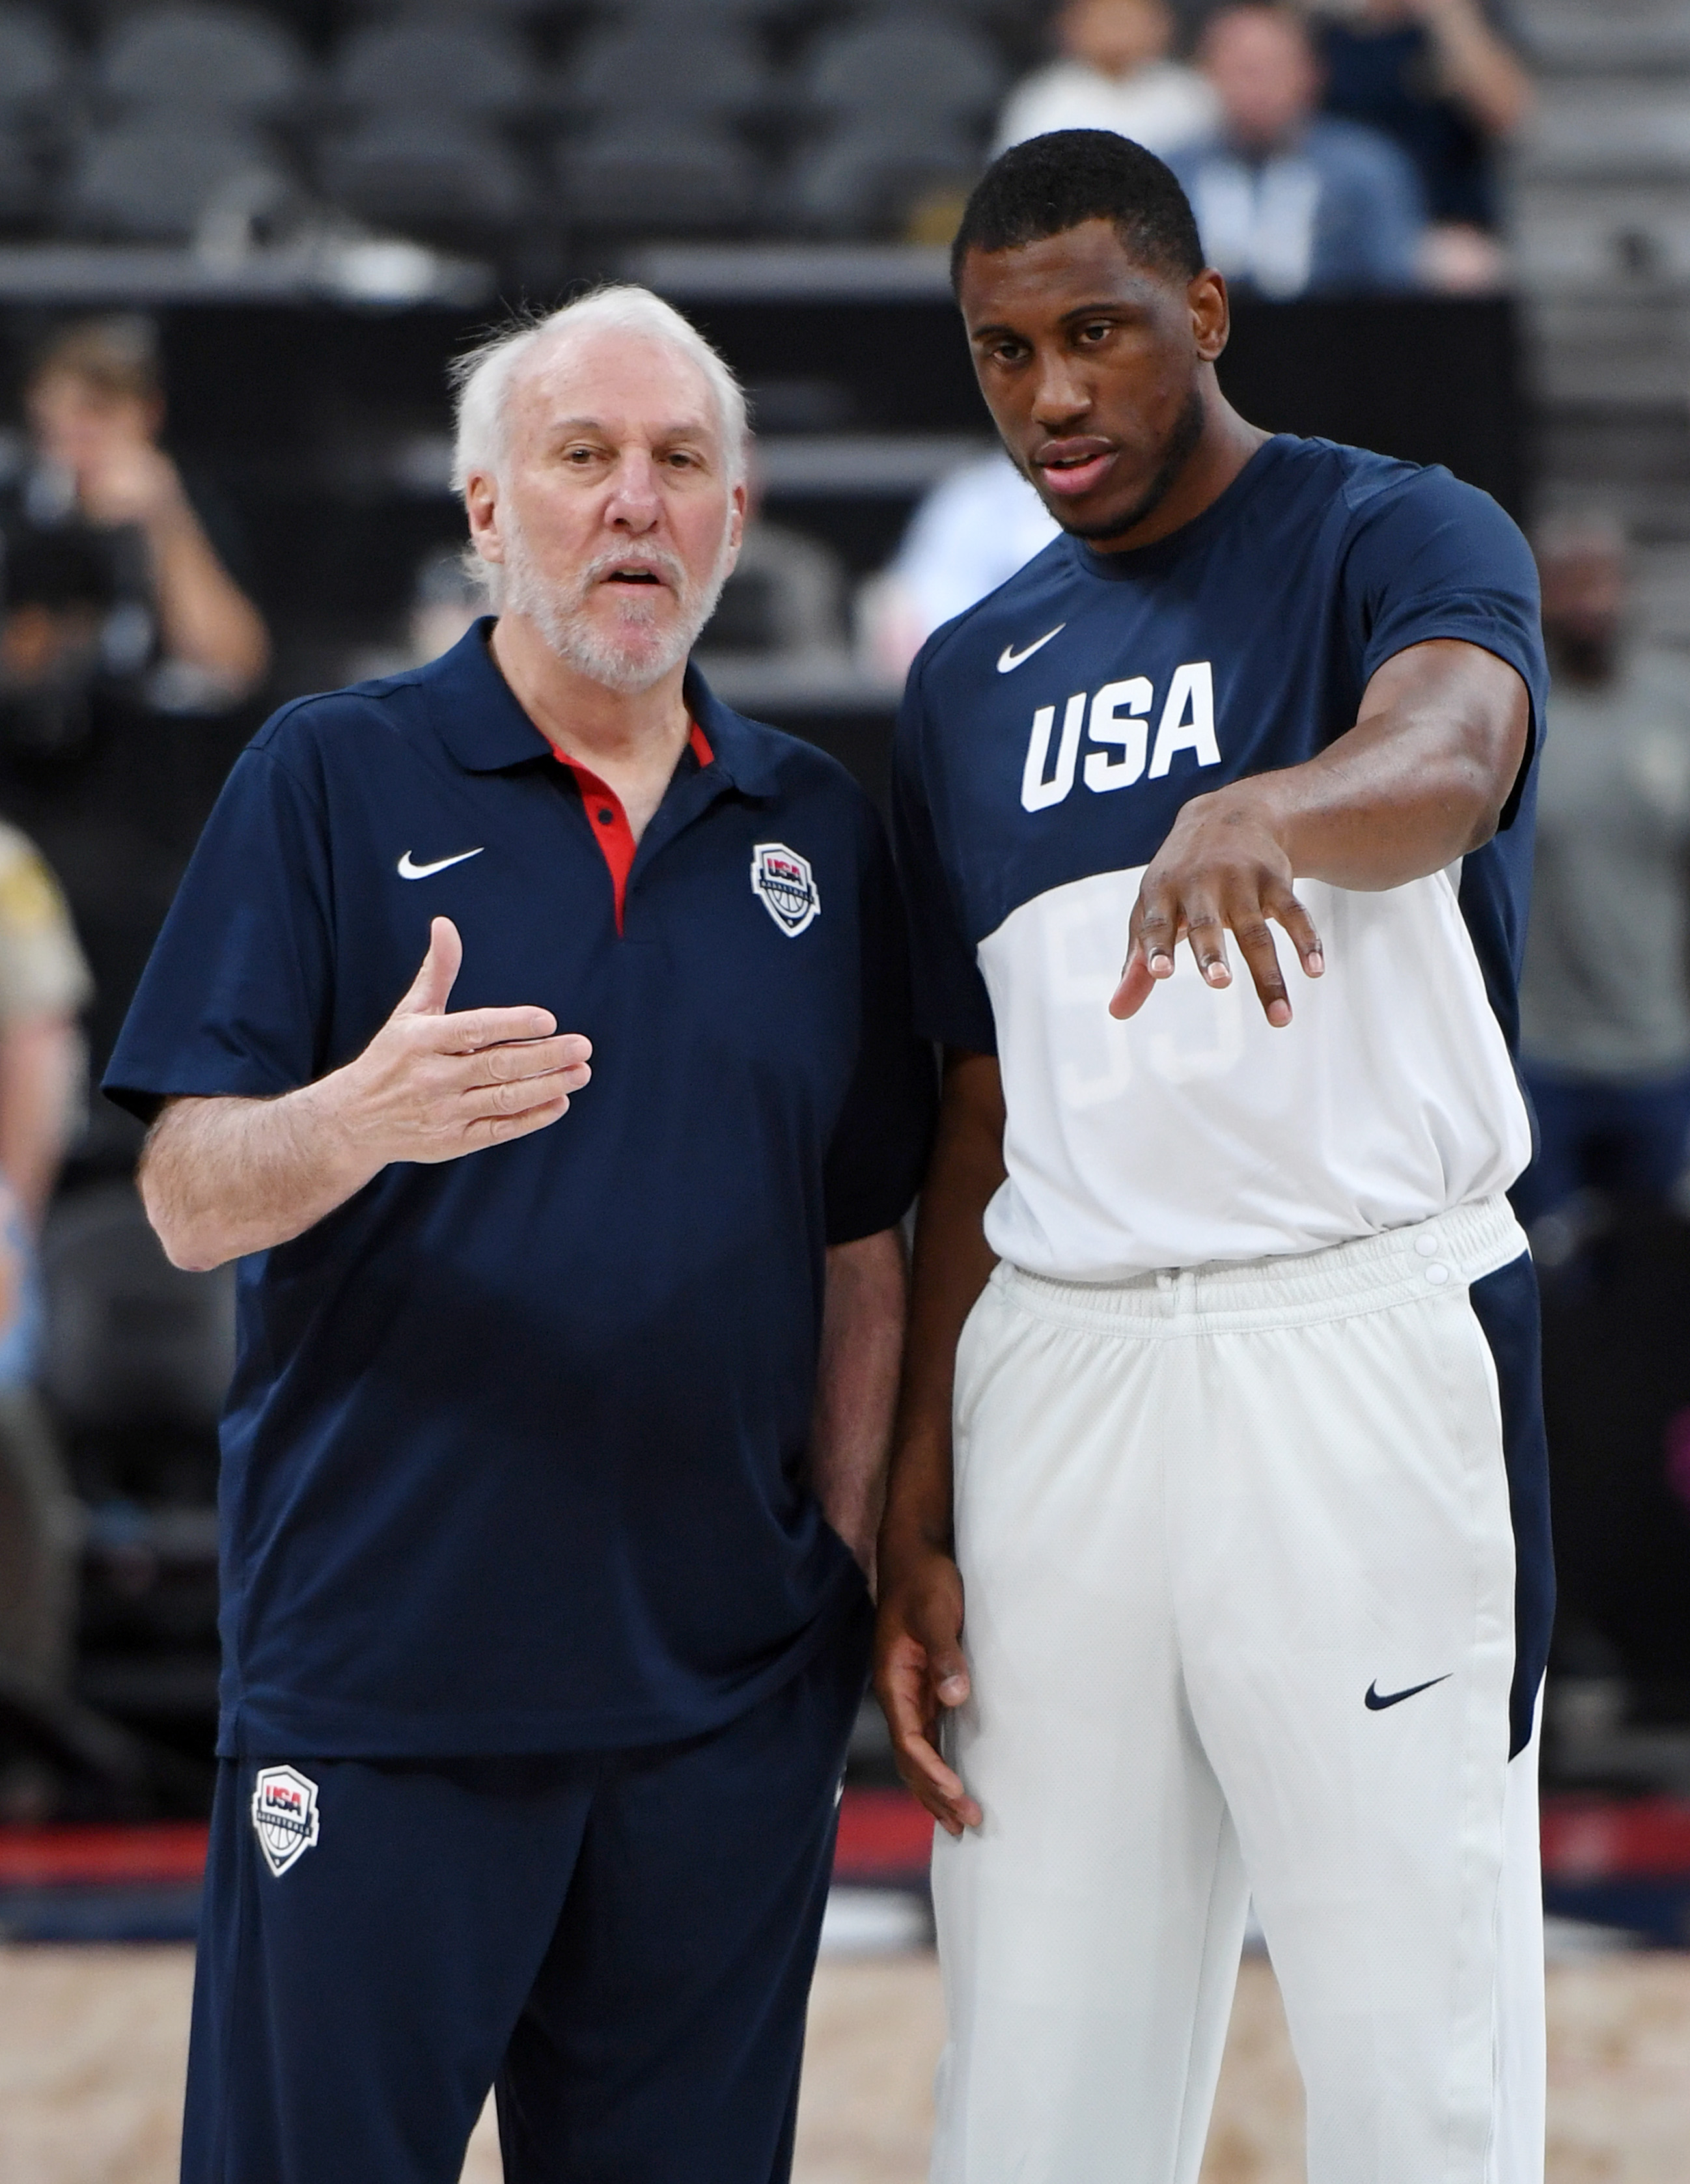 USA Basketball Men's National Team - USA White v USA Blue